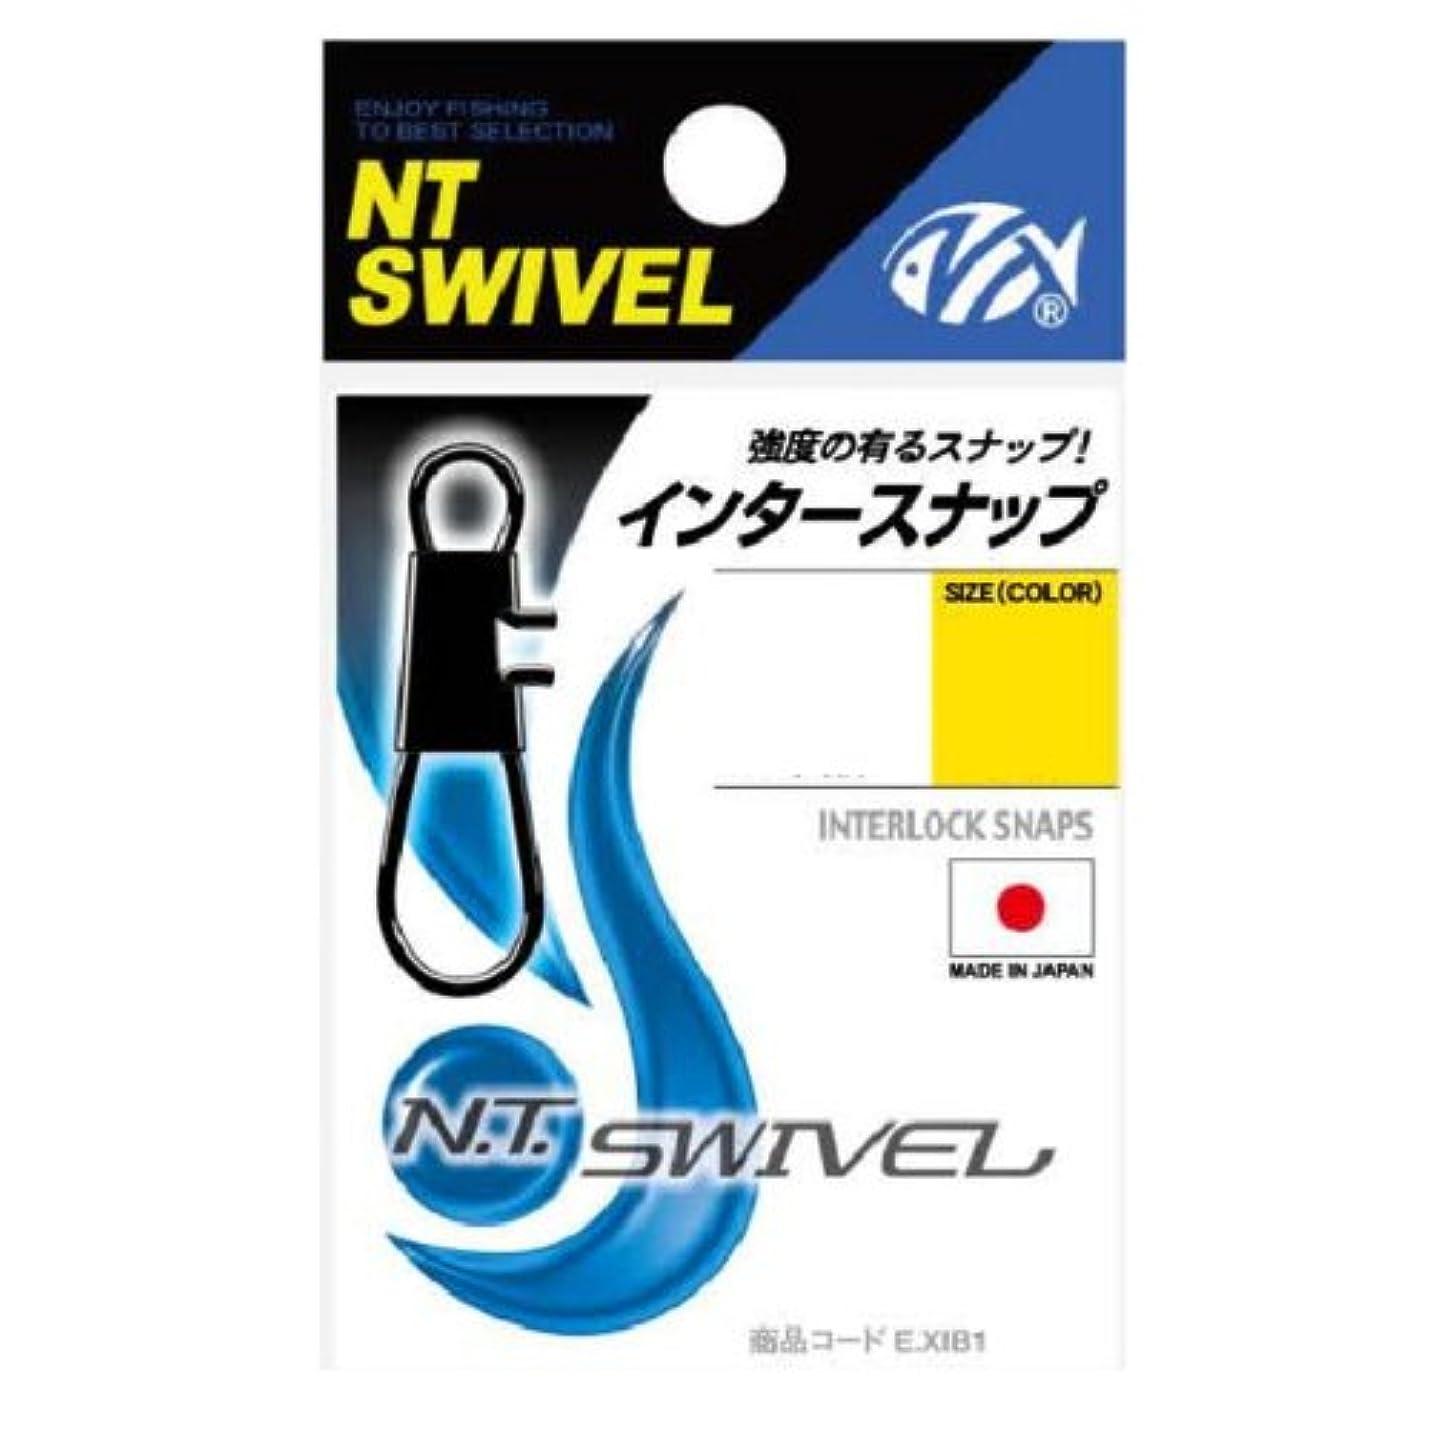 NTスイベル(N.T.SWIVEL) インタースナップ クロ #6